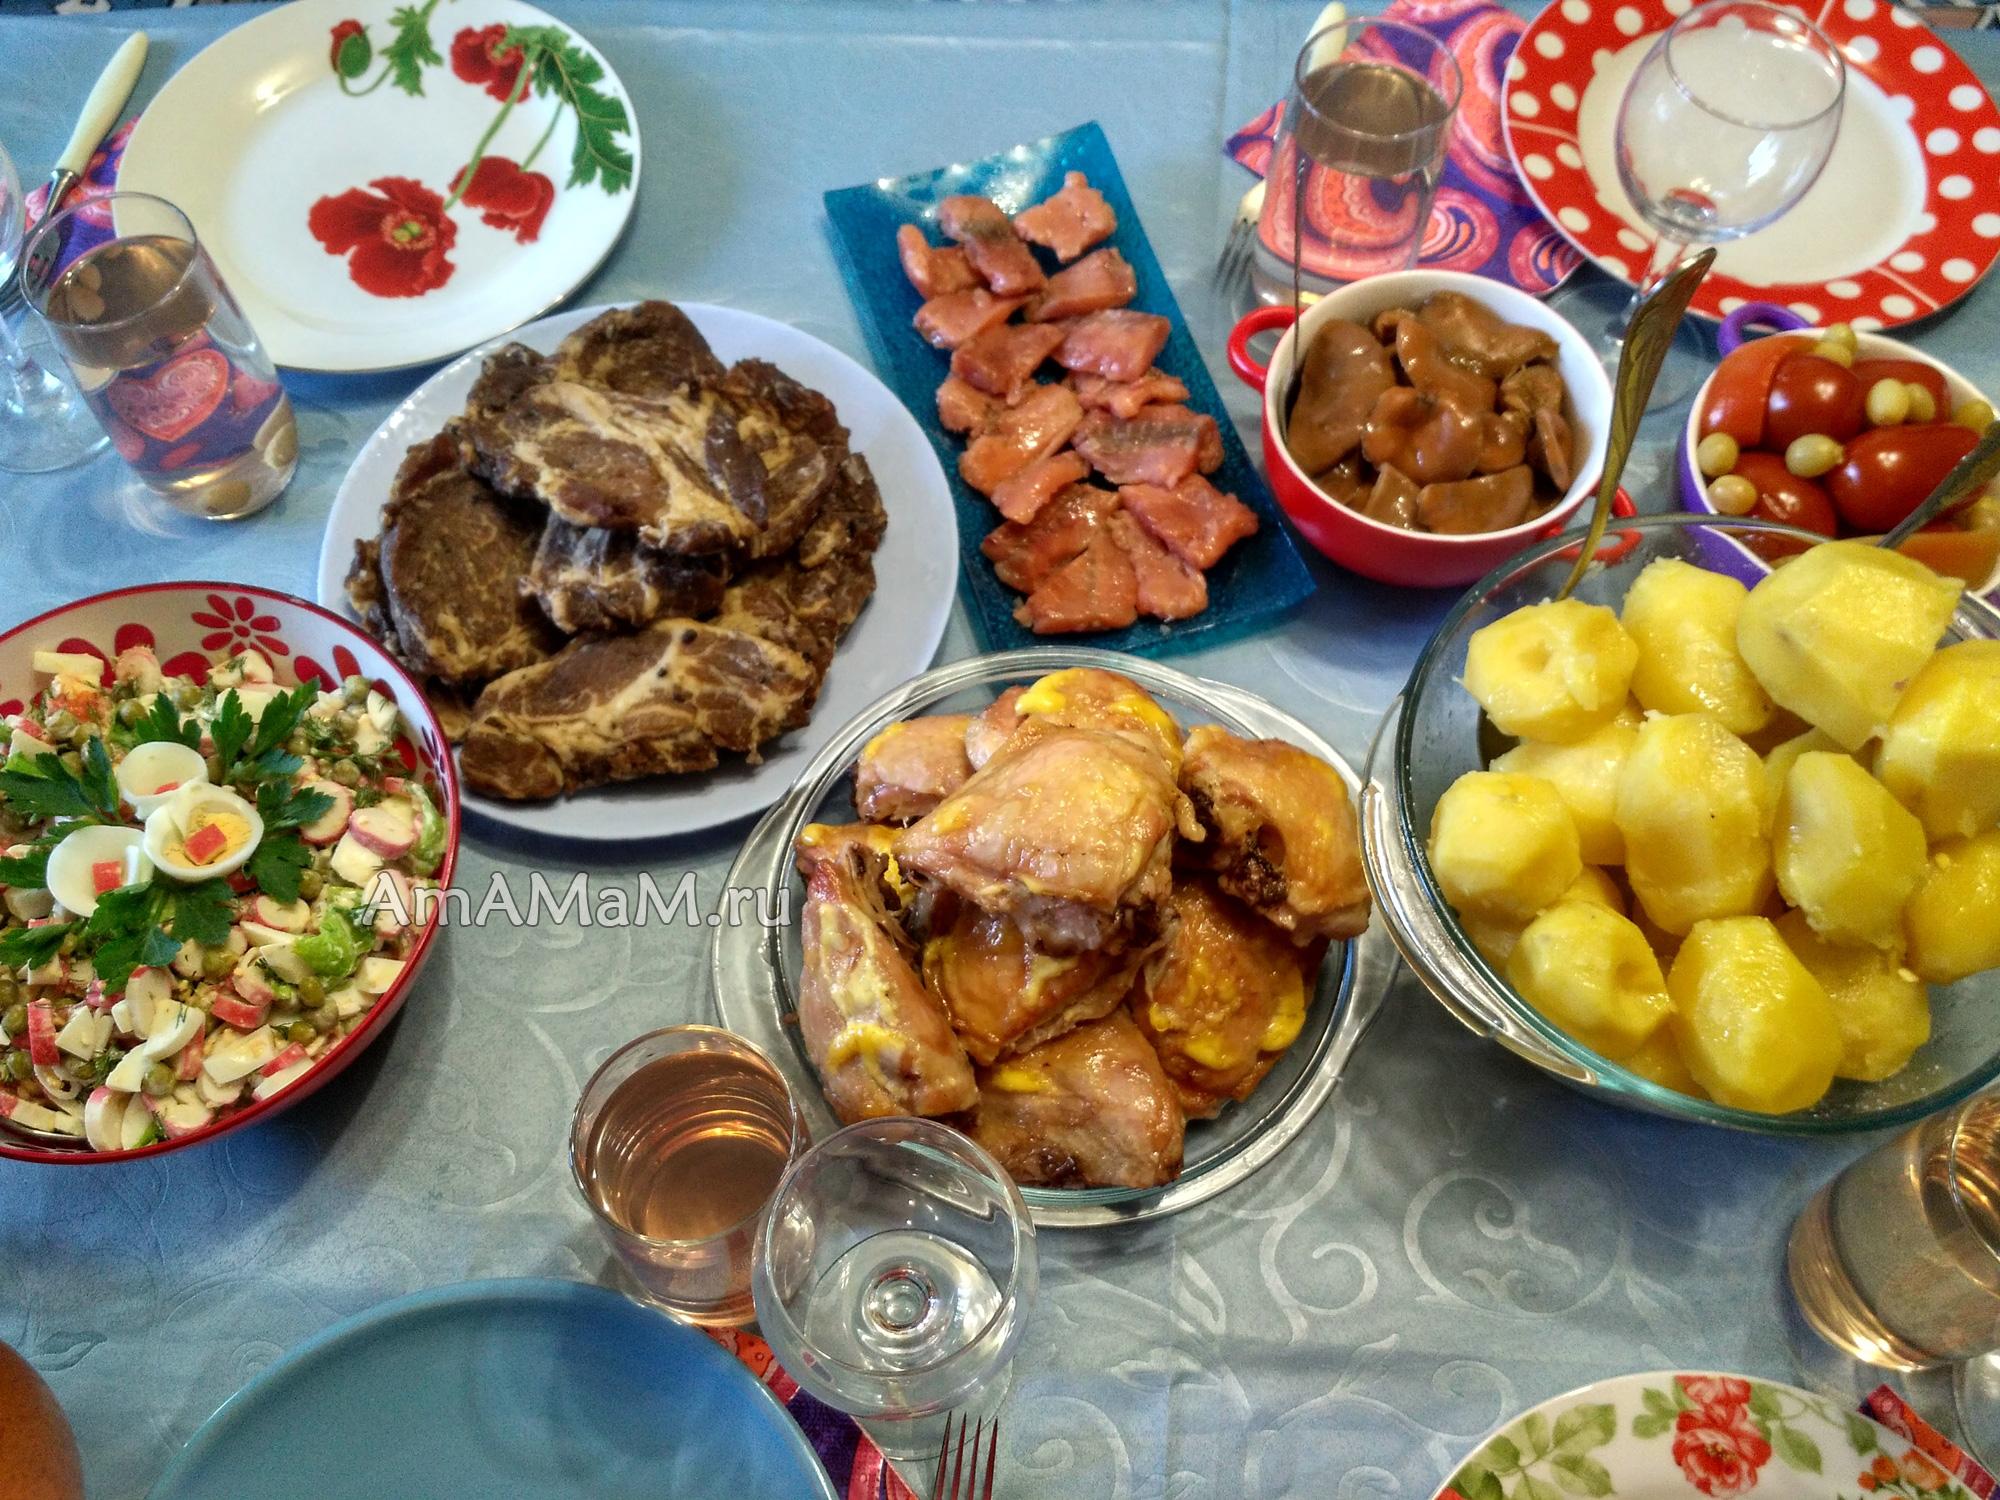 Меню праздничного обеда дома